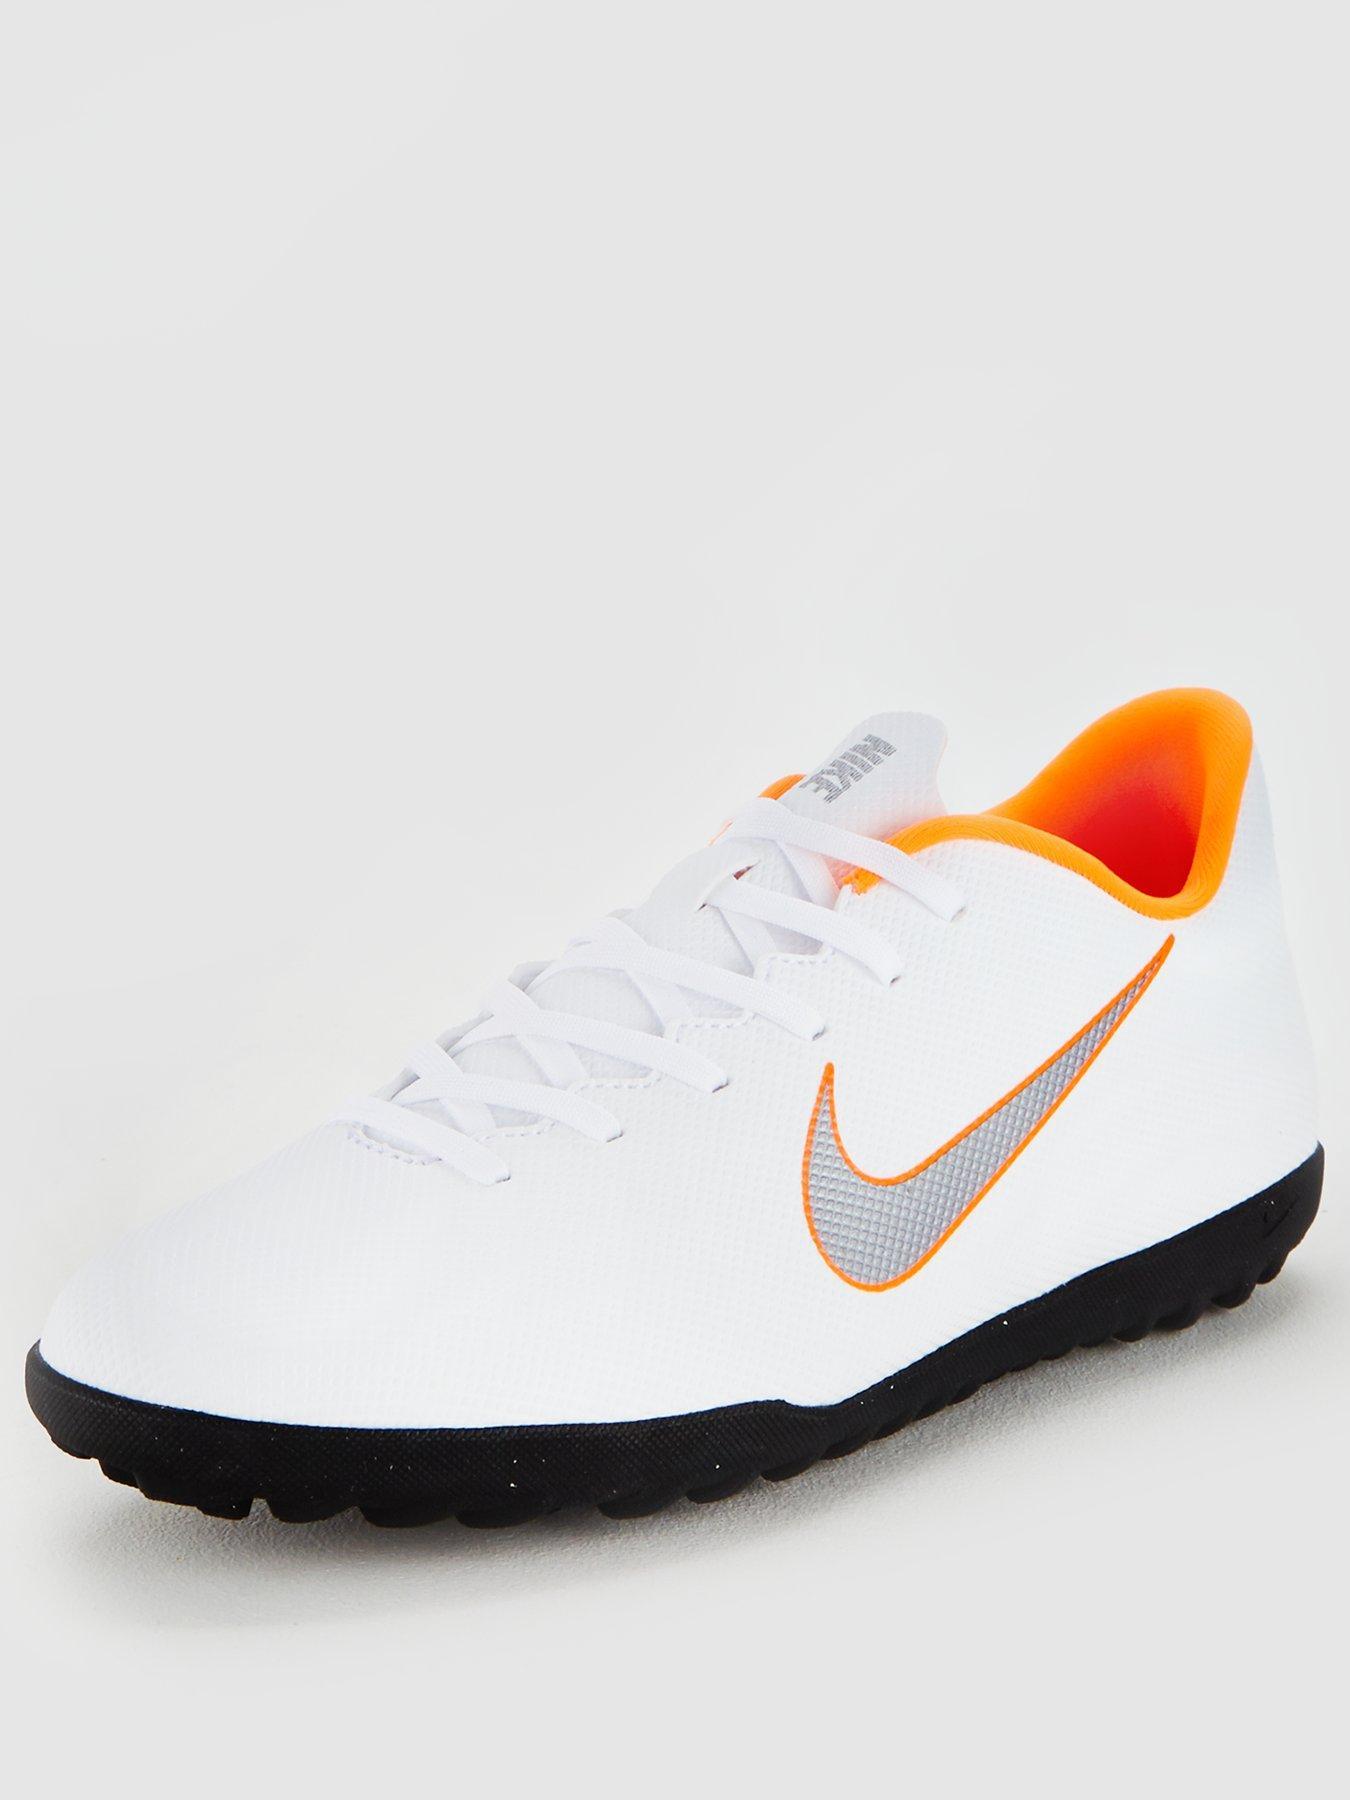 3bc2ac7499b nike turf shoes nike mercurial football boots with sock - Harga ...